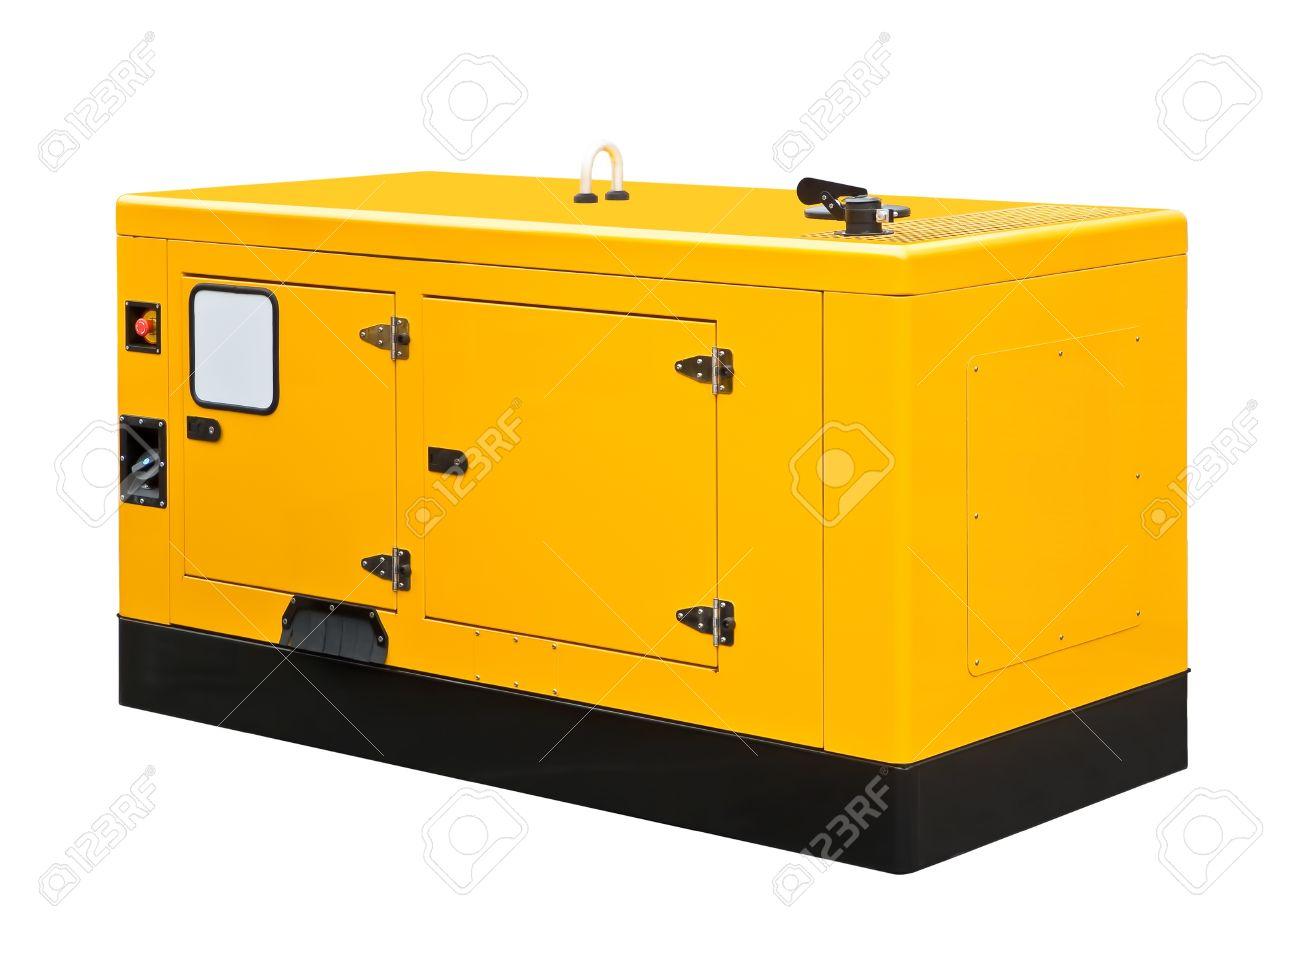 Big generator Standard-Bild - 21621453